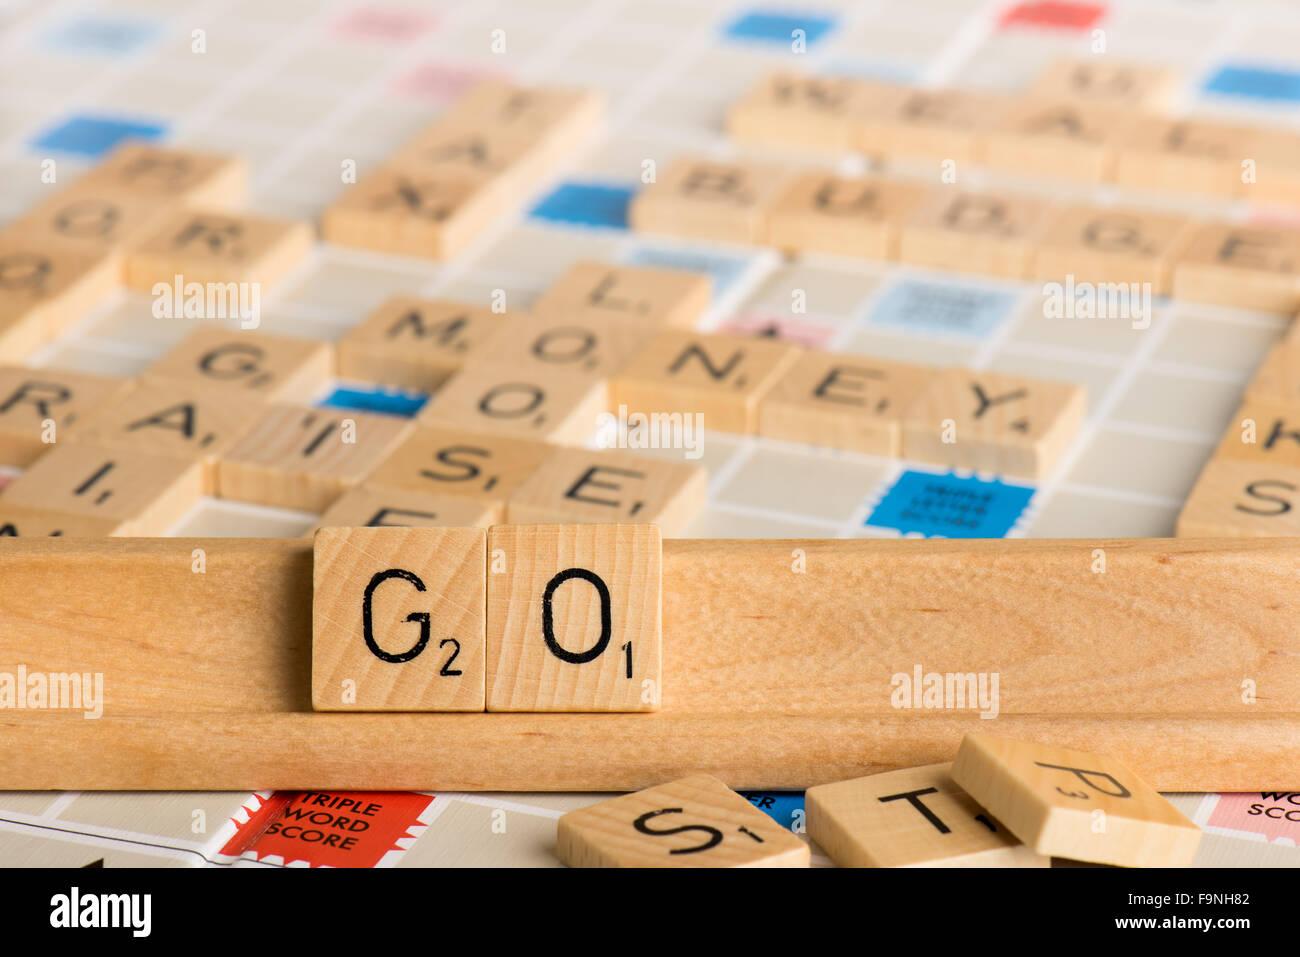 Scrabble - GO - Stock Image